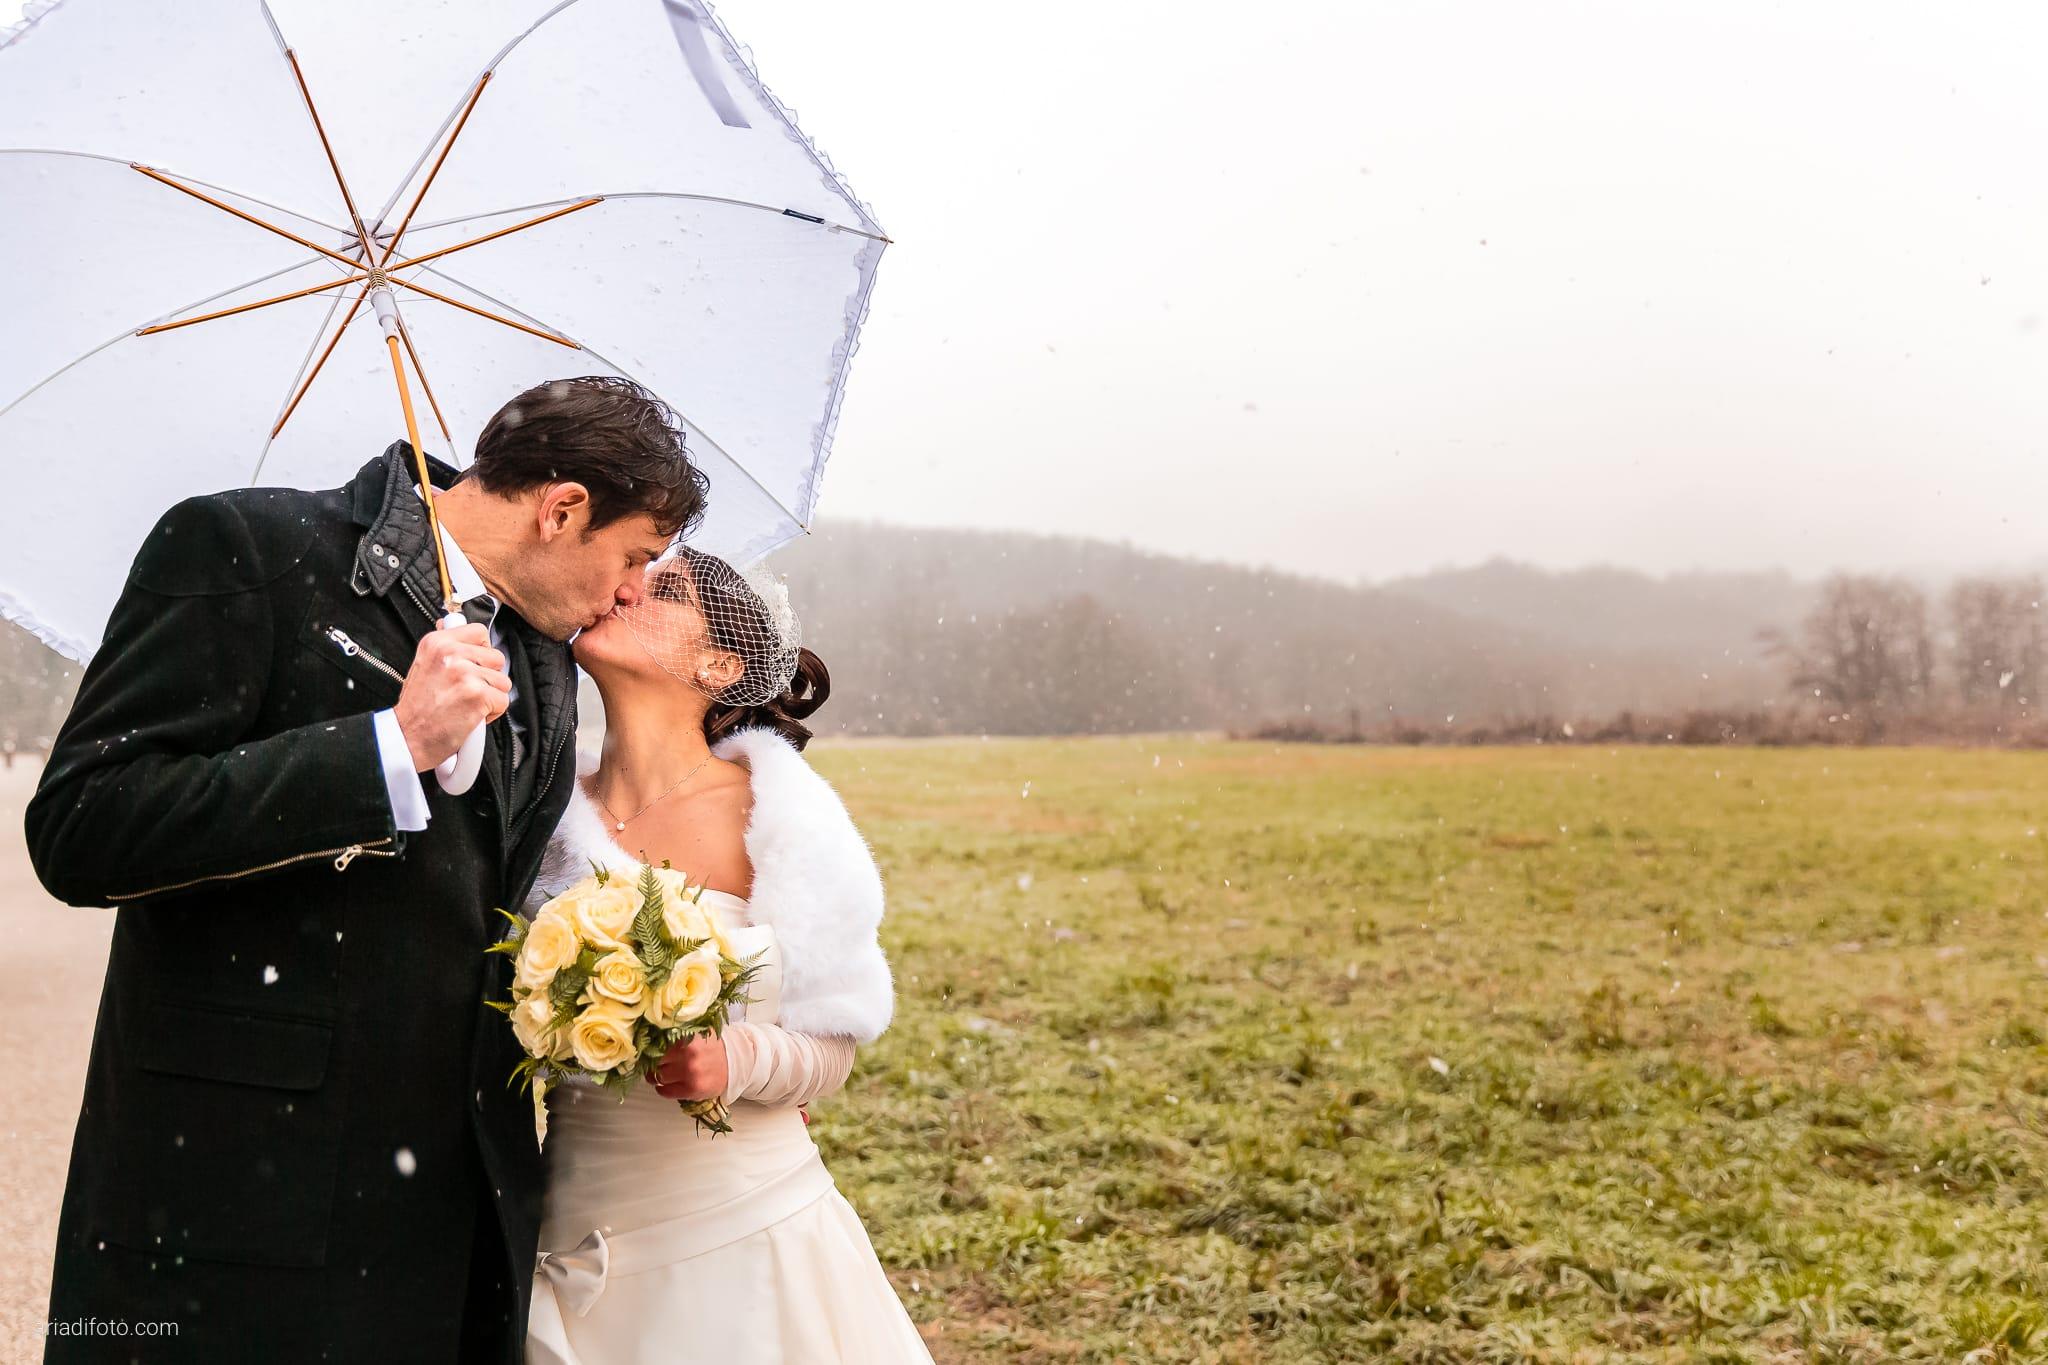 Elisa Matteo matrimonio Preval Gorizia Paradiso Pocenia Udine ritratti sposi inverno neve